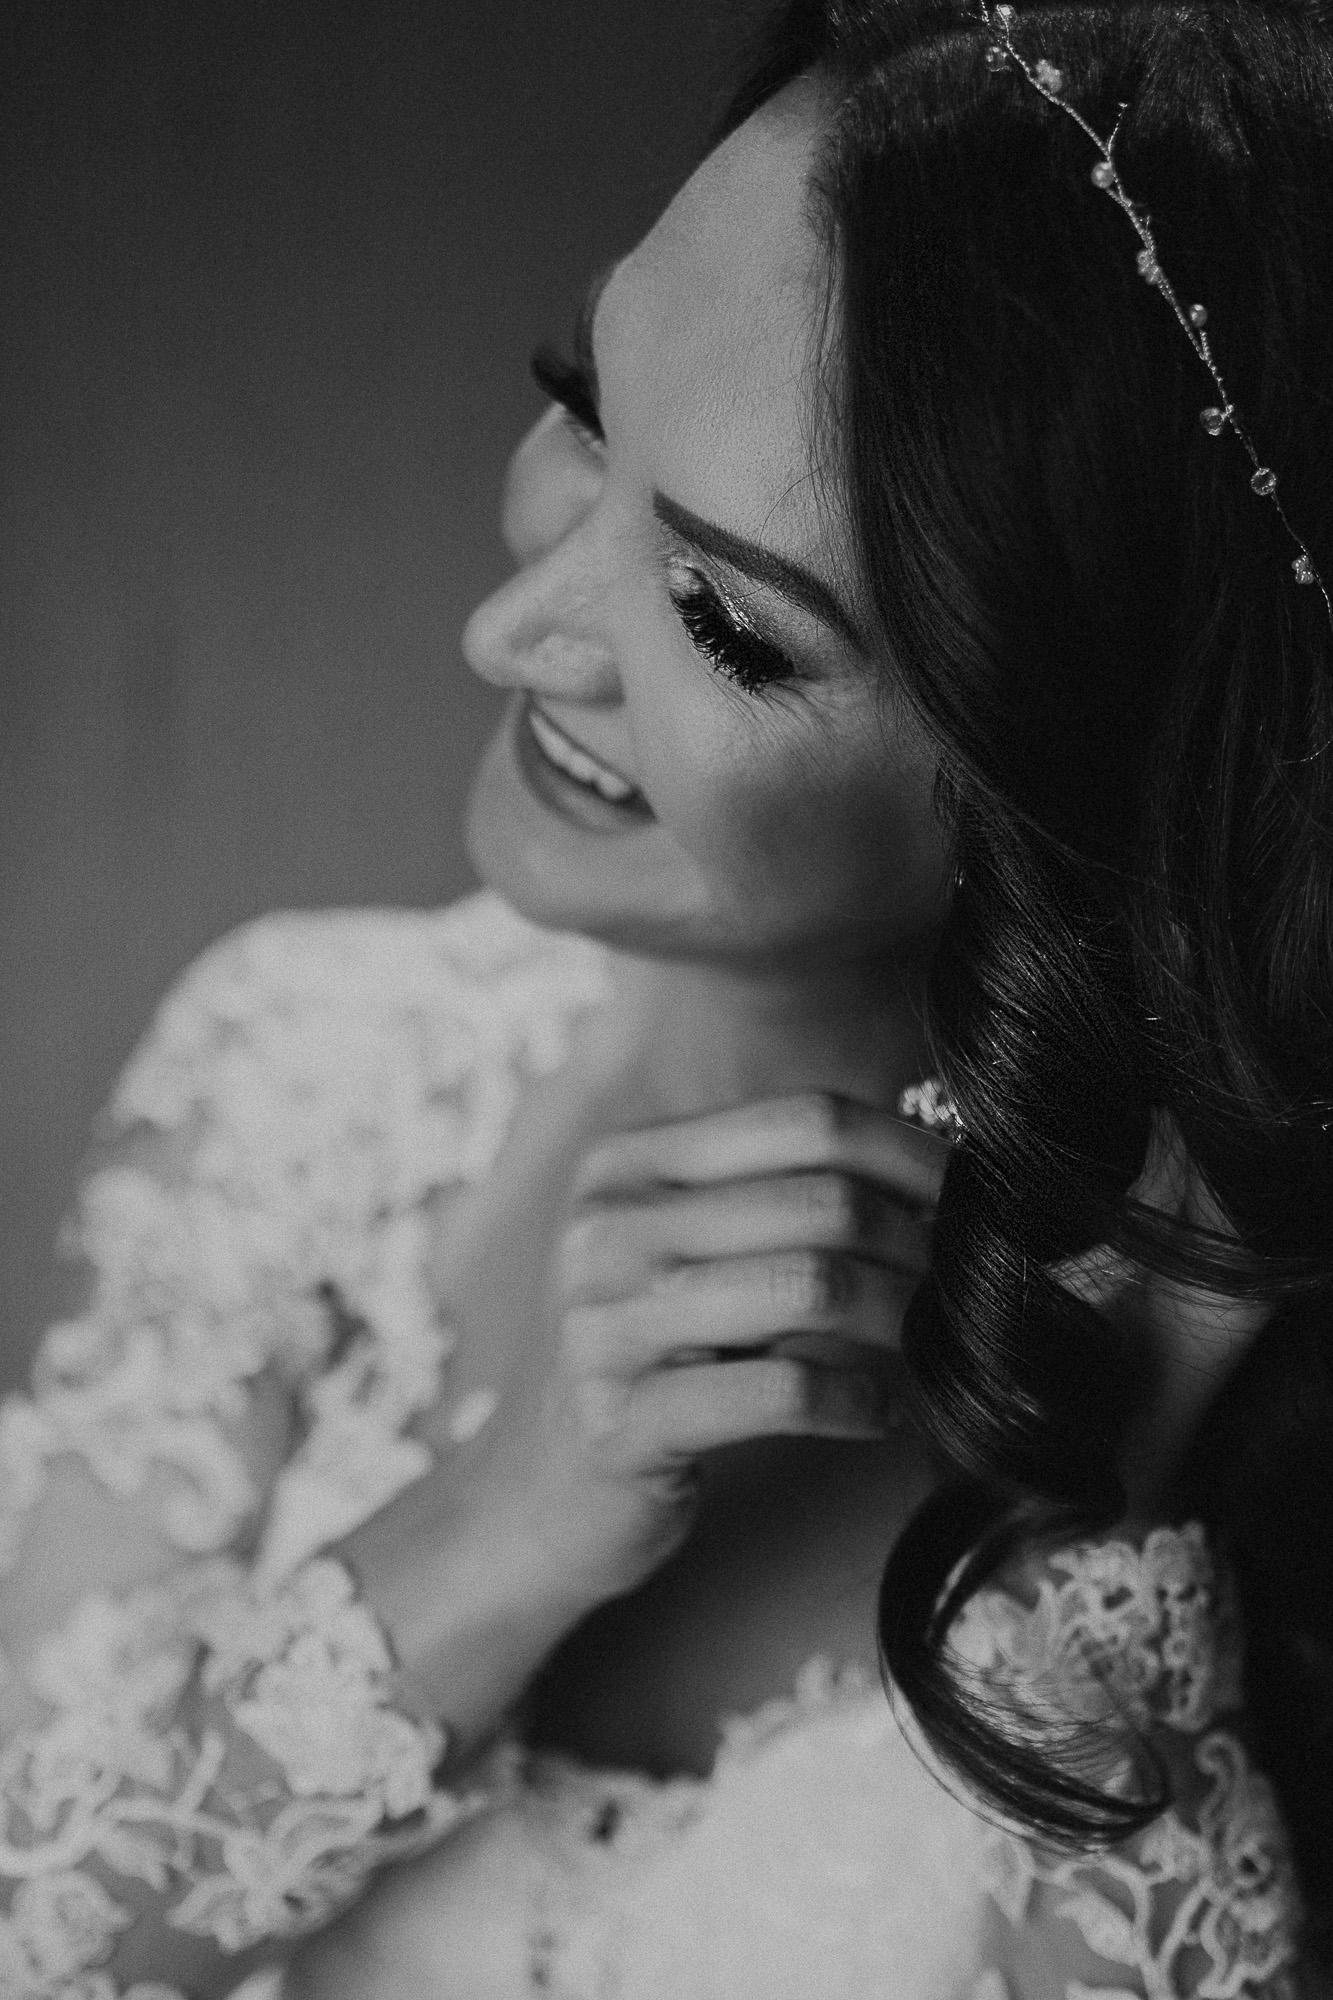 DanielaMarquardtPhotography_Hochzeitsfotograf_Düsseldorf_Köln_Mallorca_Bayern_Austria_Harz_Wedding_AileenundLennart_Weddingphotographer_Ibiza_Tuskany_Italien_Toskana_Portugal_Lissabon54